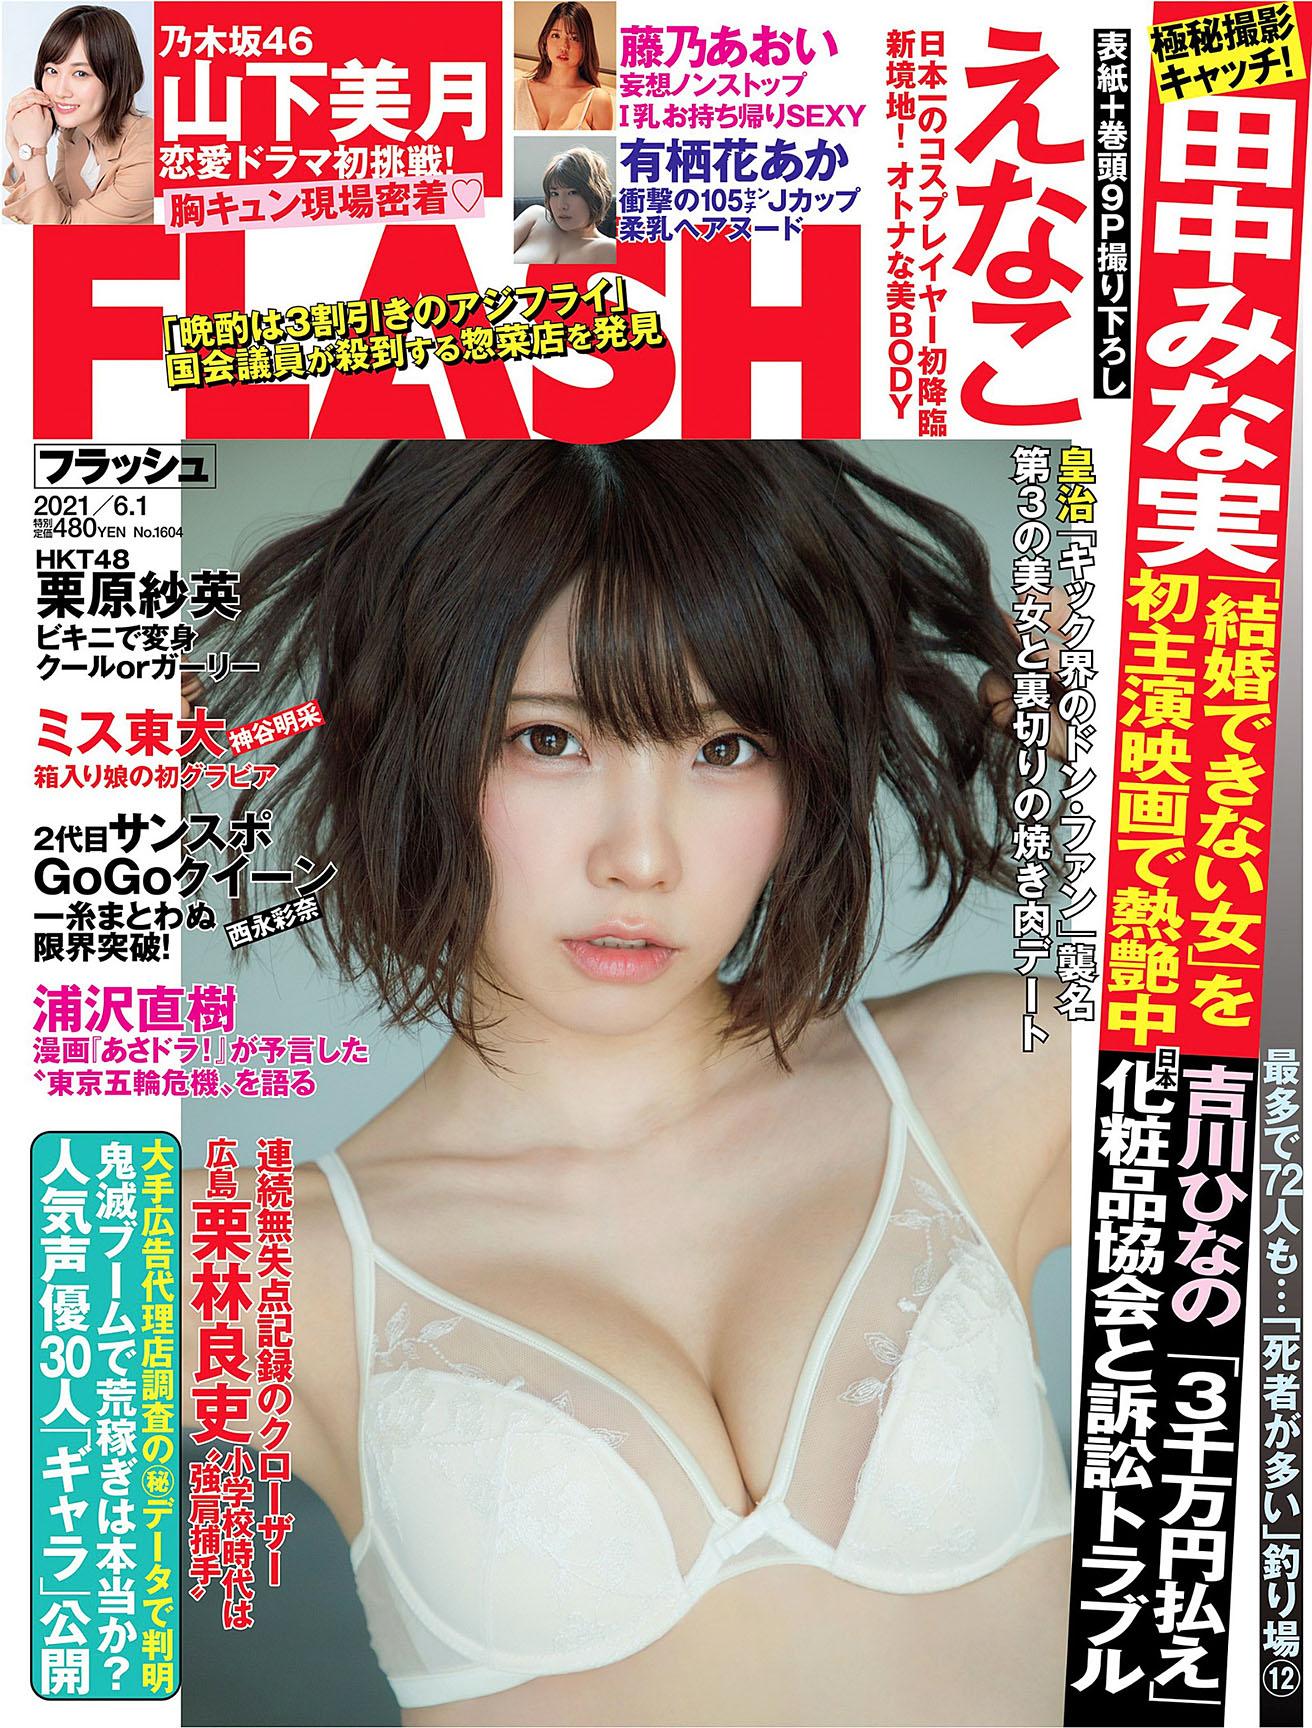 Enako Flash 210601 01.jpg